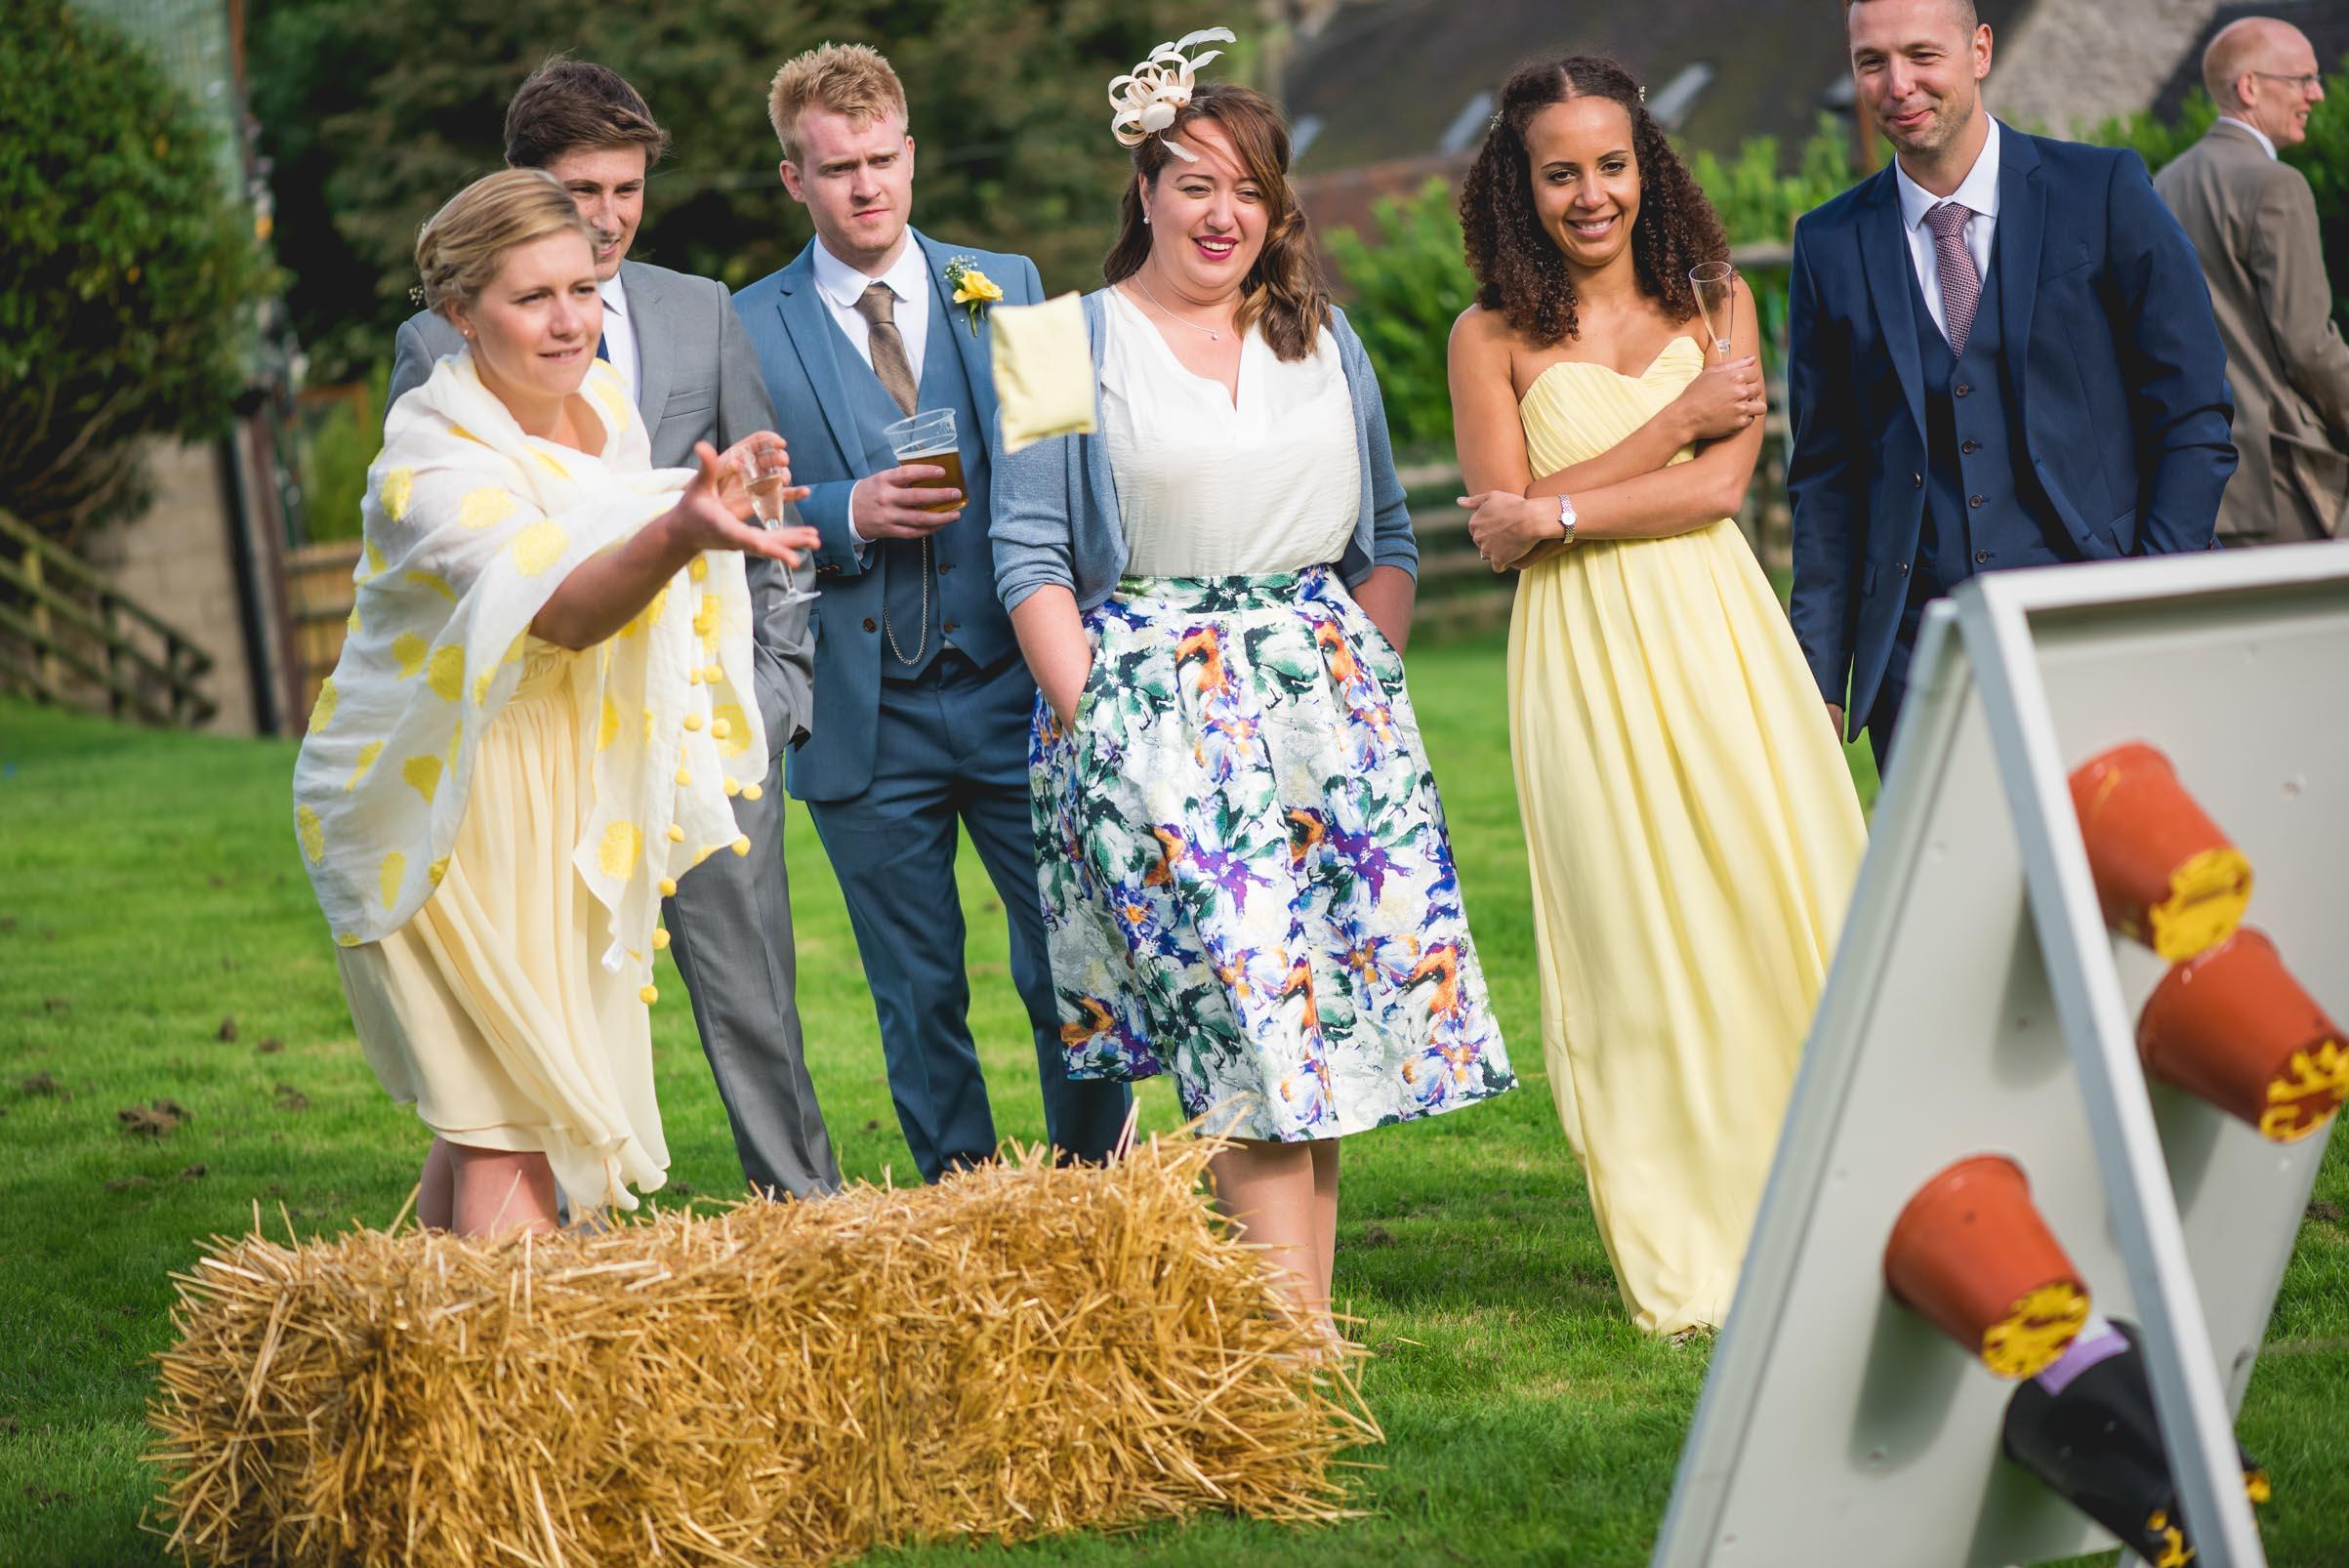 Peak+district+farm+wedding+lower+damgate+photographer-159.jpg